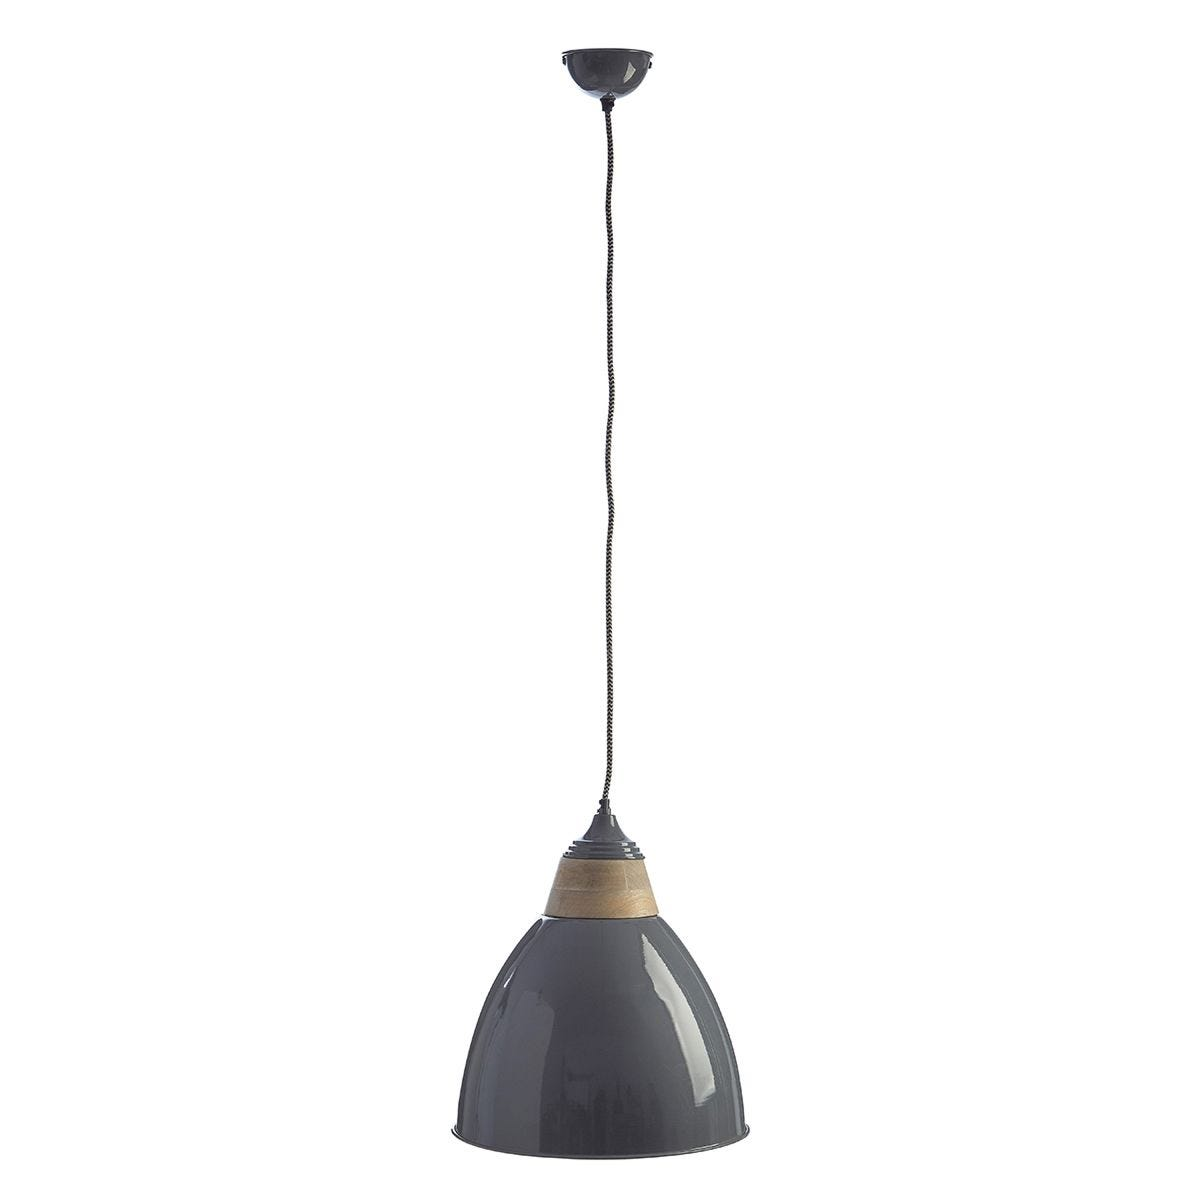 Premier Housewares Oslo Large Pendant Light in Iron/Wood - Grey